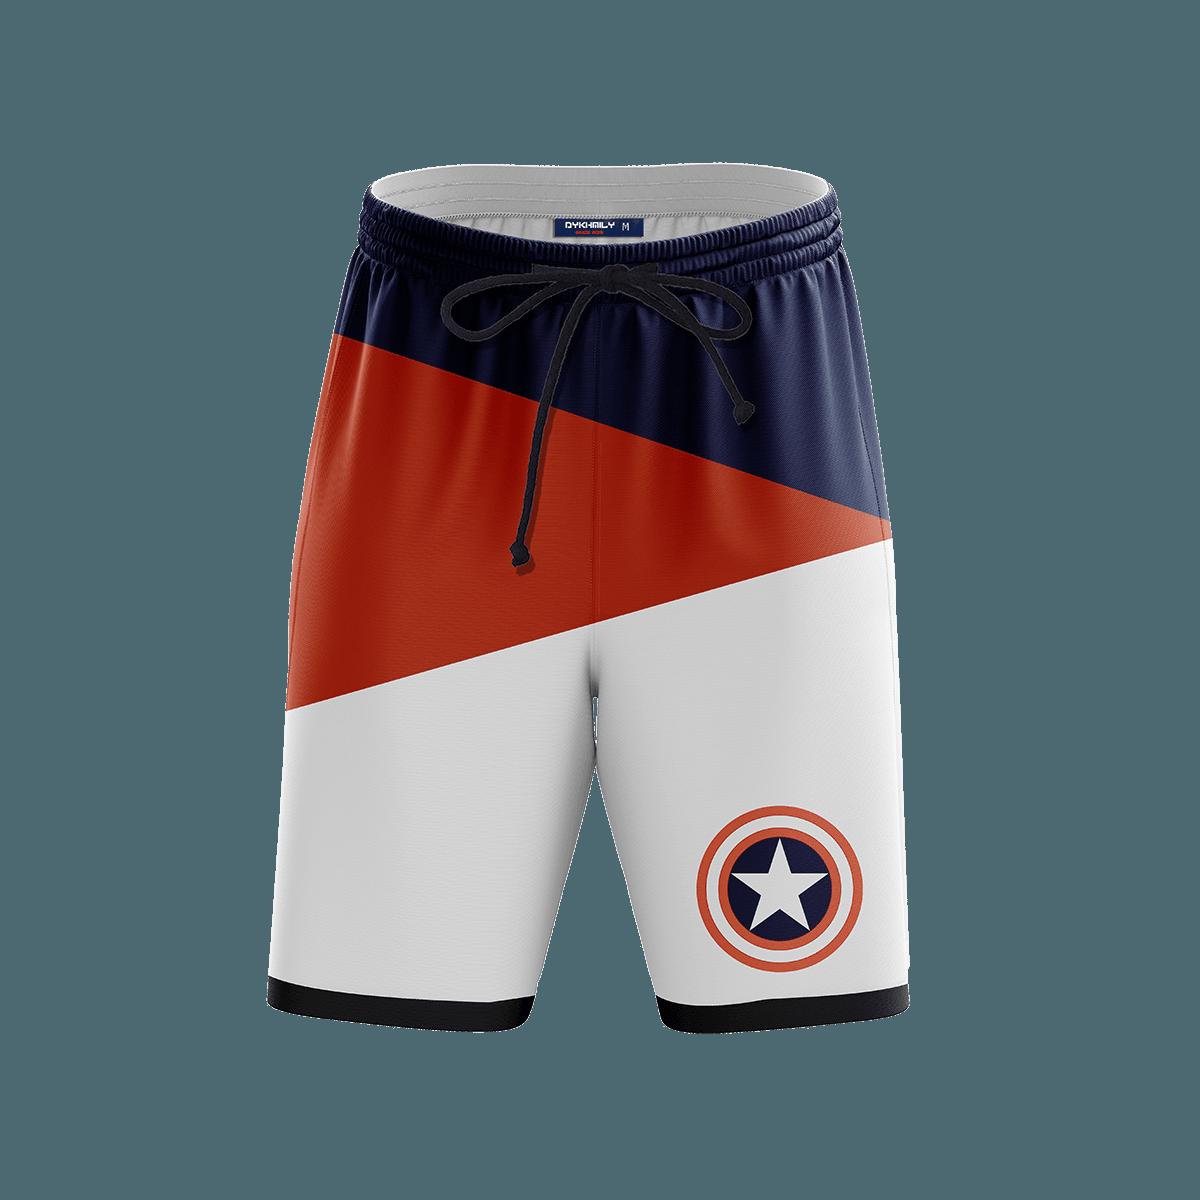 Captain Steve  Beach Shorts FDM3107 S Official Anime Swimsuit Merch